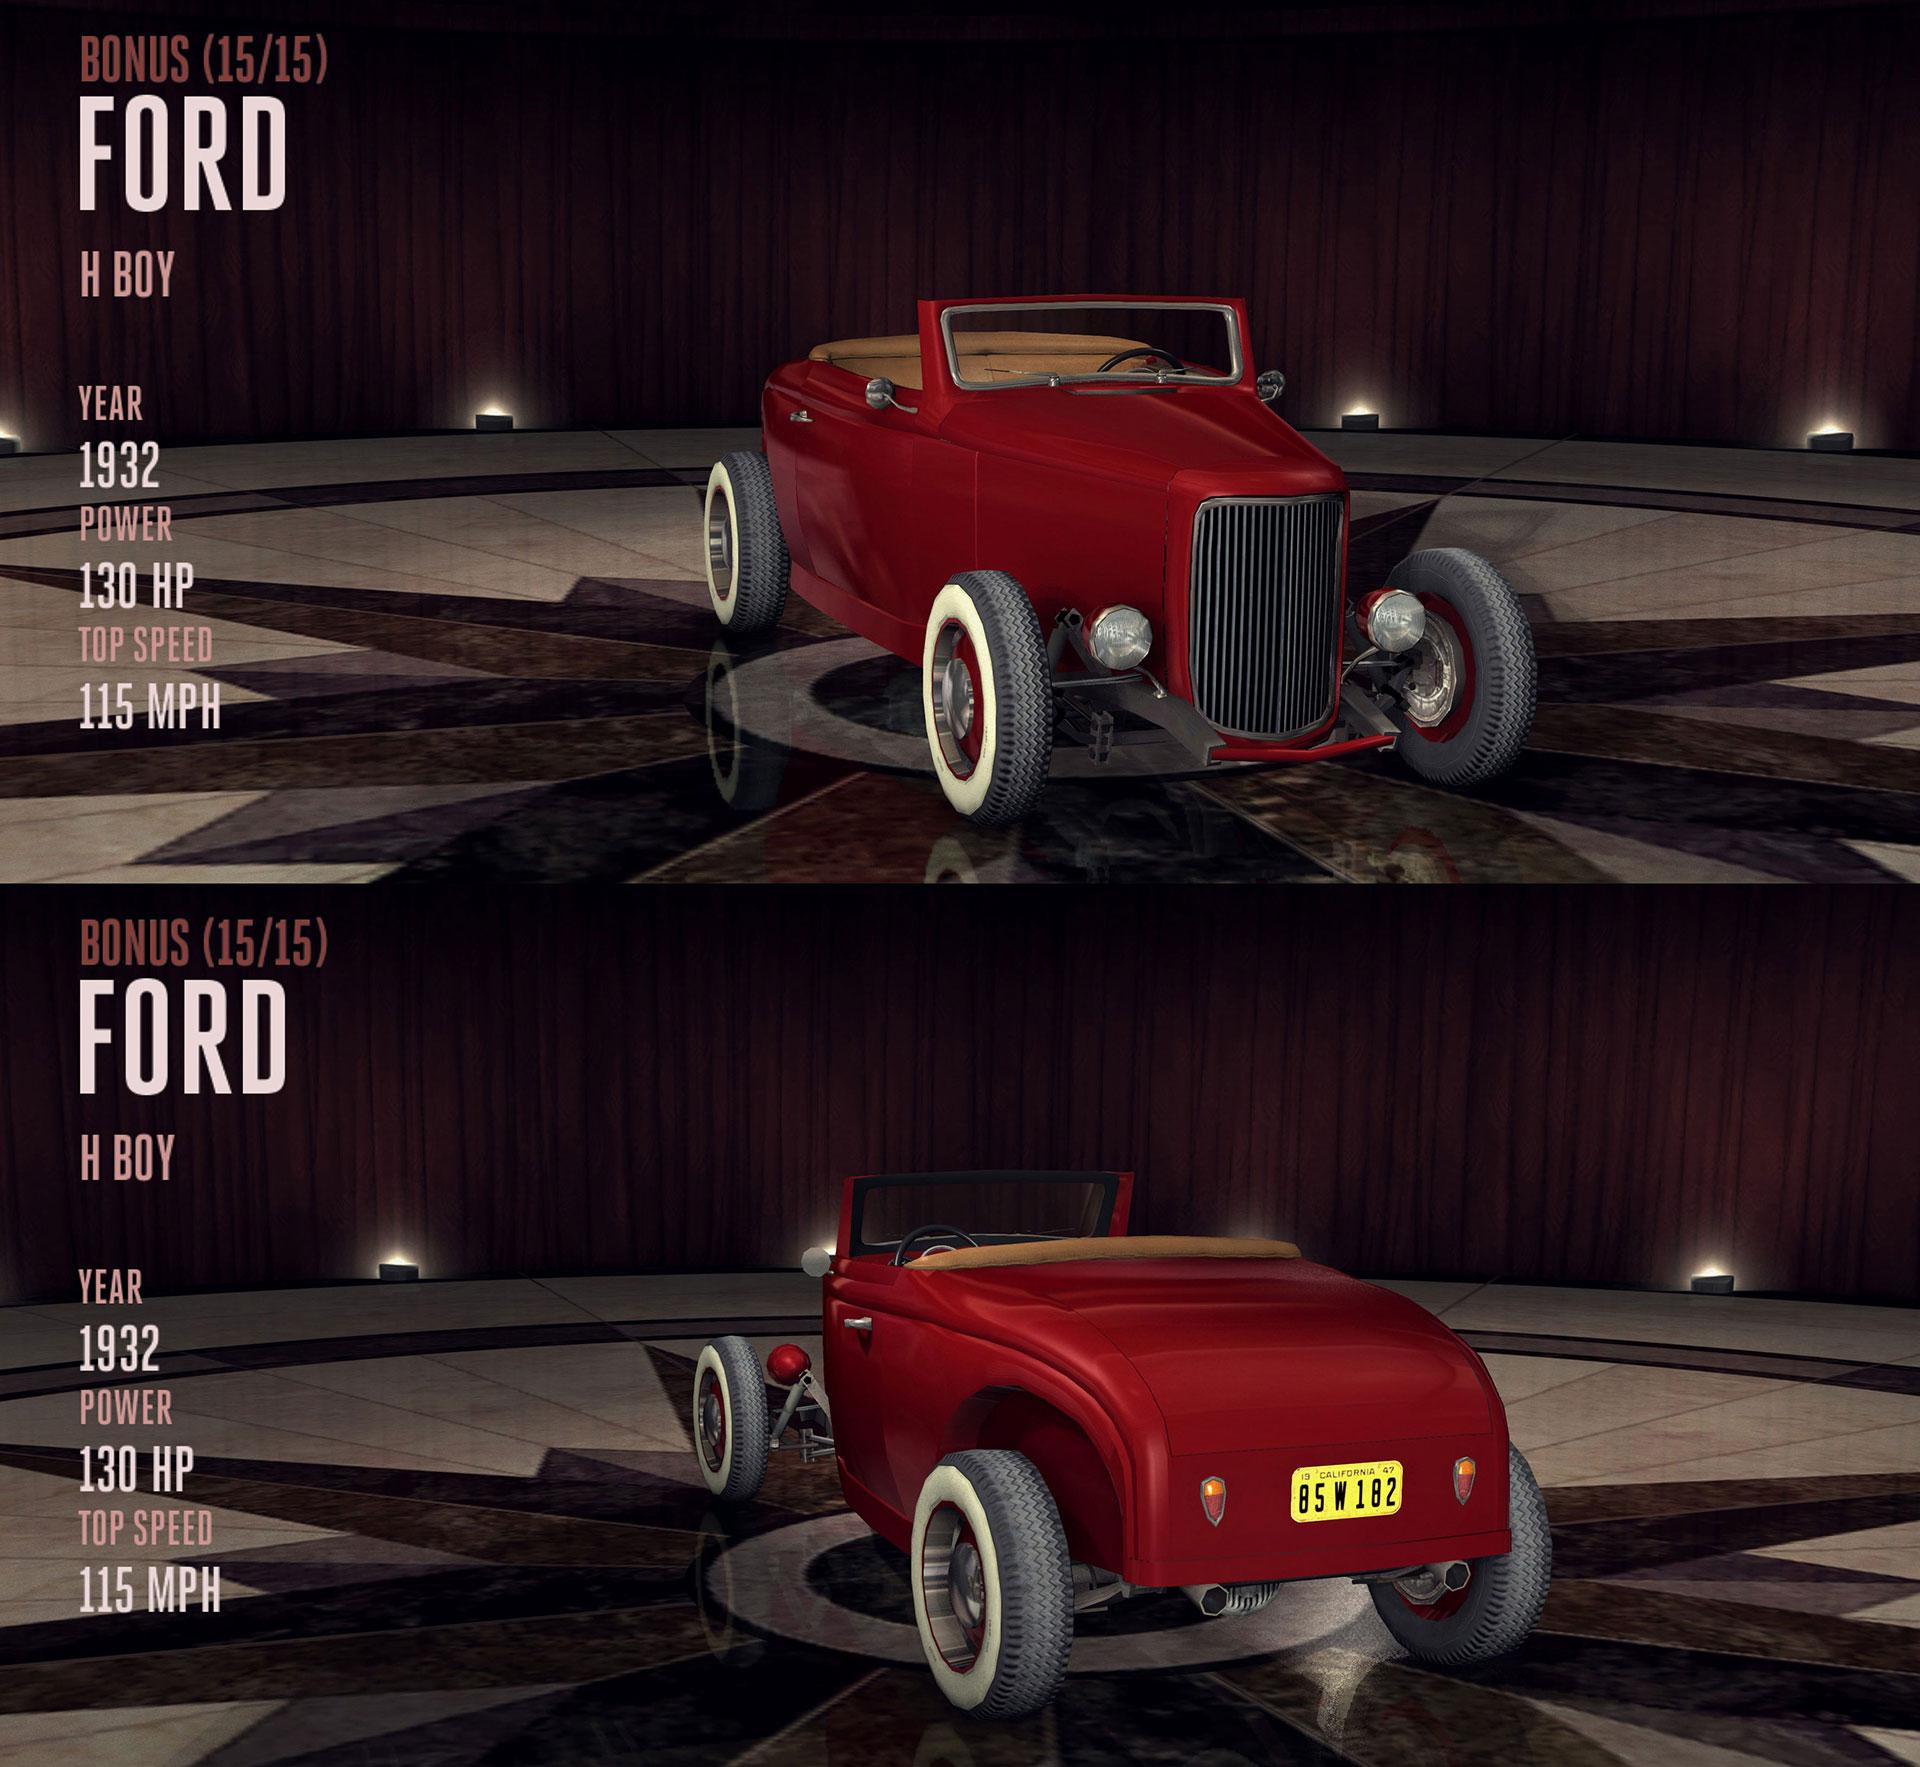 Archivo:1932-ford-h-boy.jpg